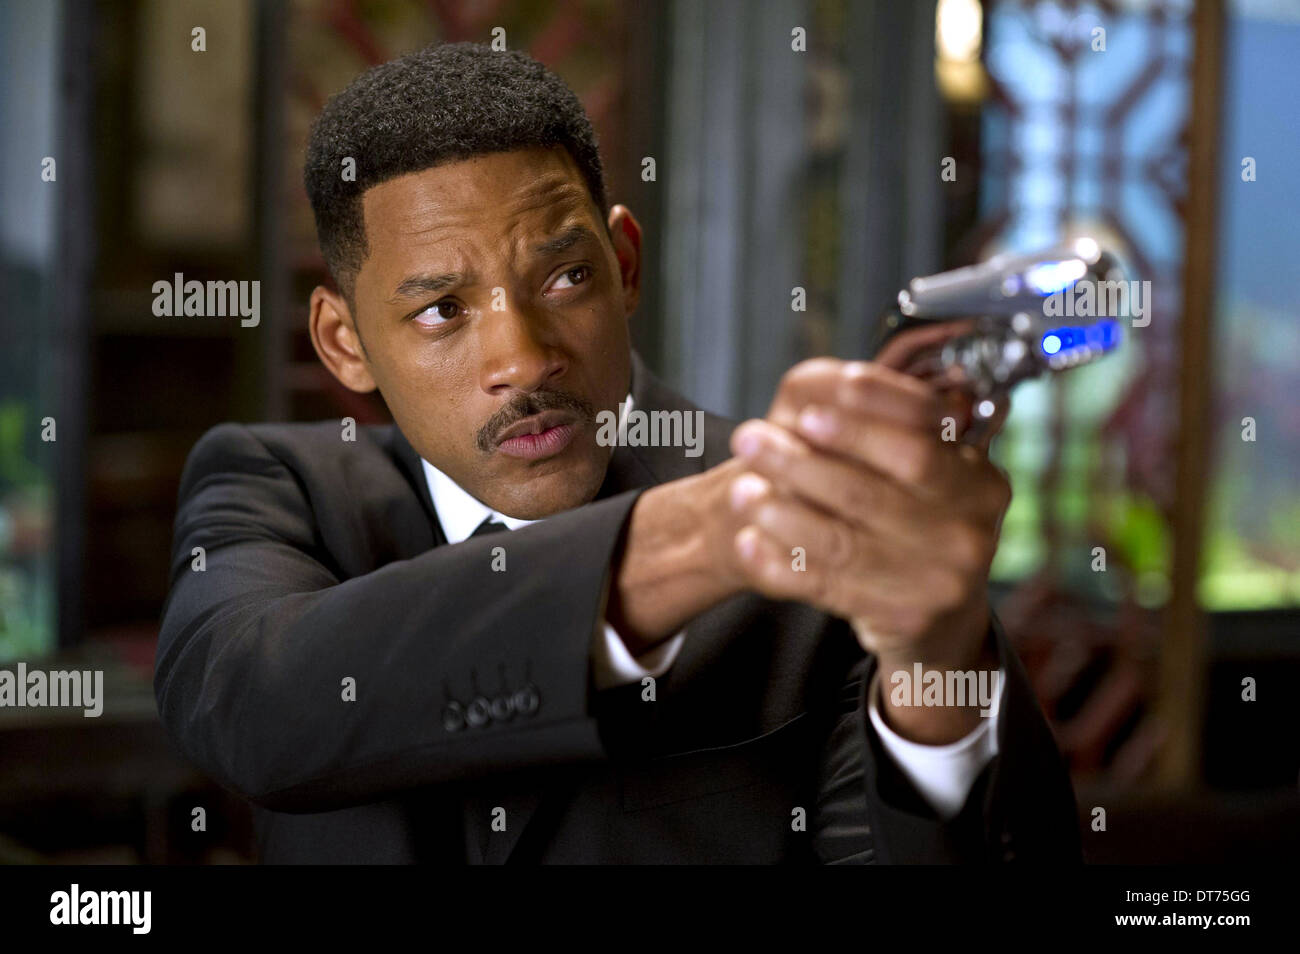 WILL SMITH MEN IN BLACK III (2012) - Stock Image